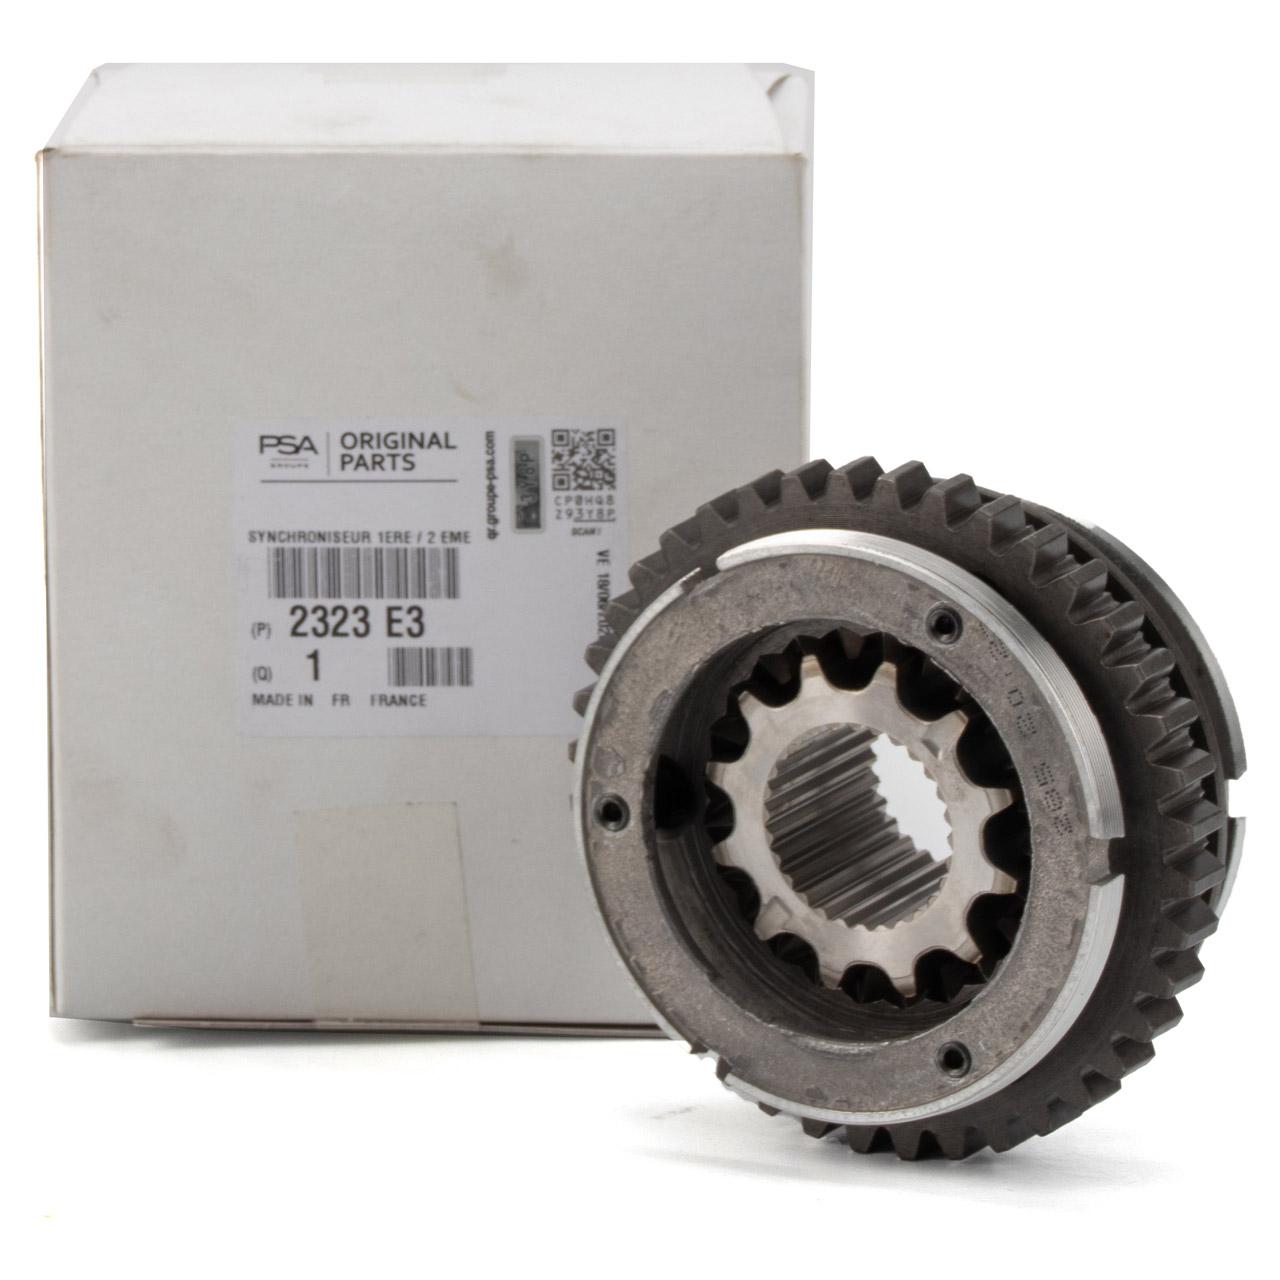 ORIGINAL Citroen Peugeot Synchronring BE4R Schaltgetriebe 2323.E3